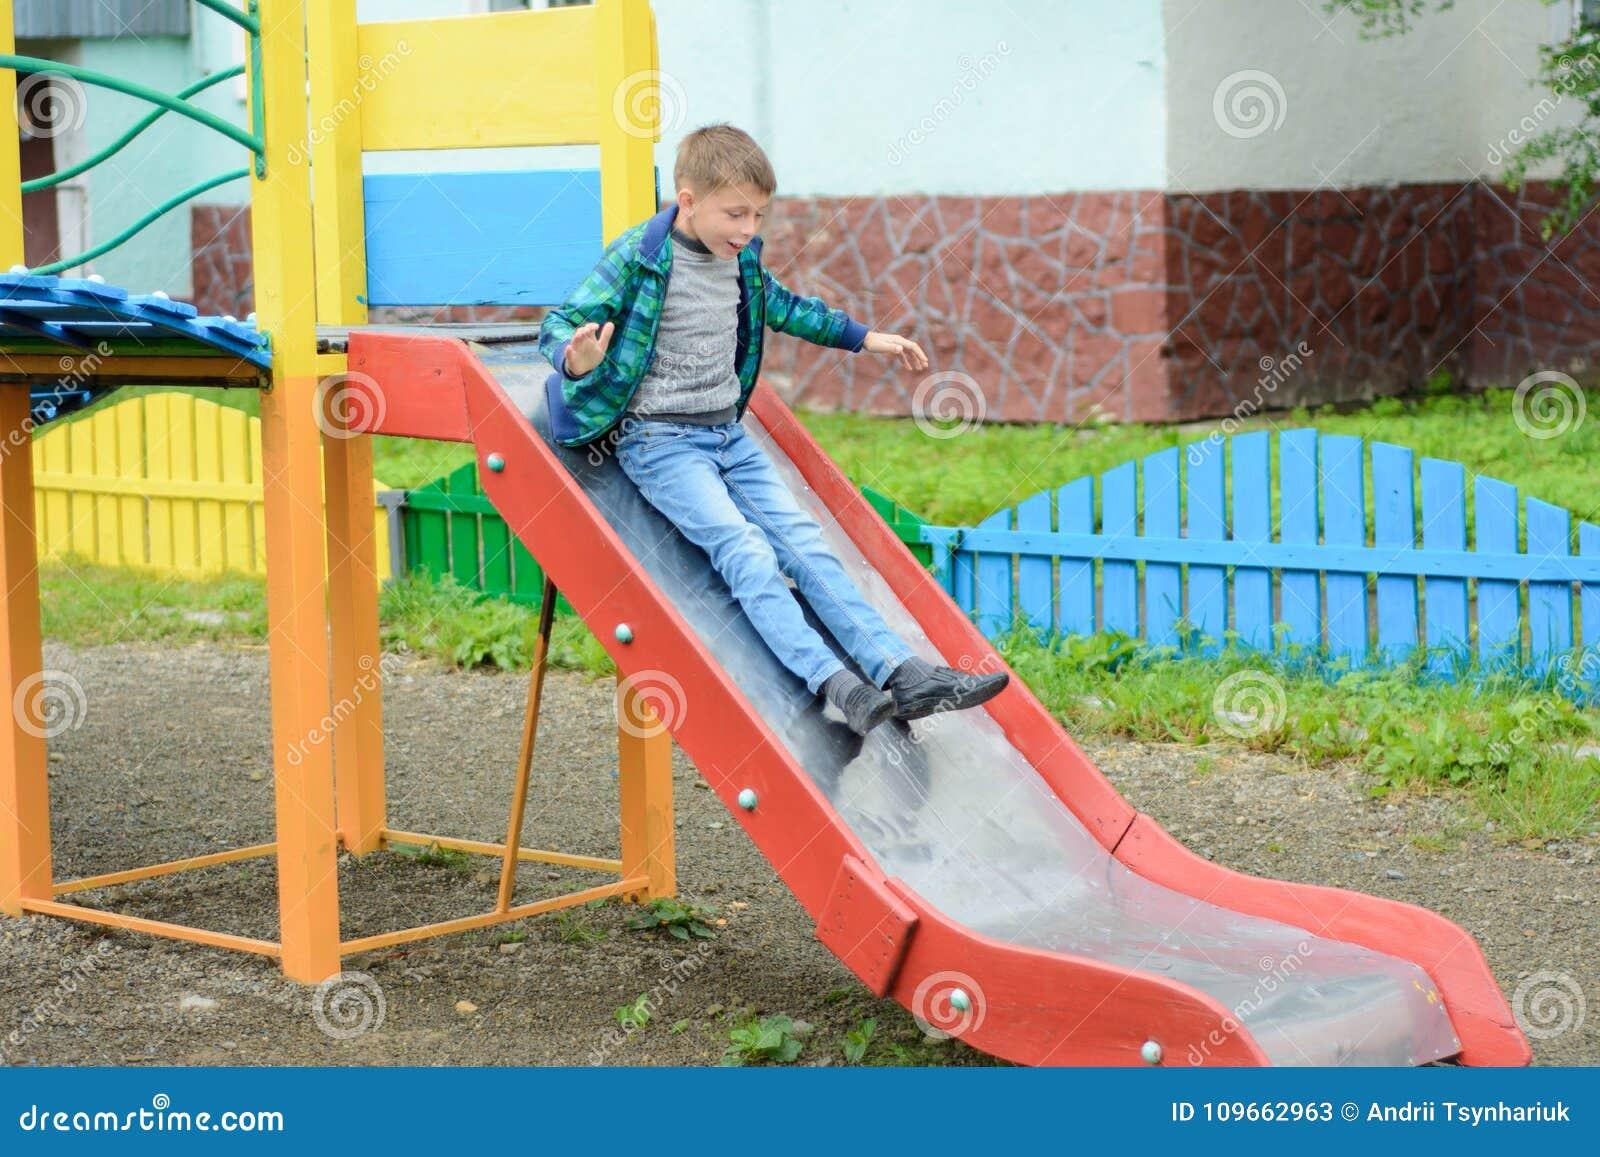 Funny children play on a children`s playground